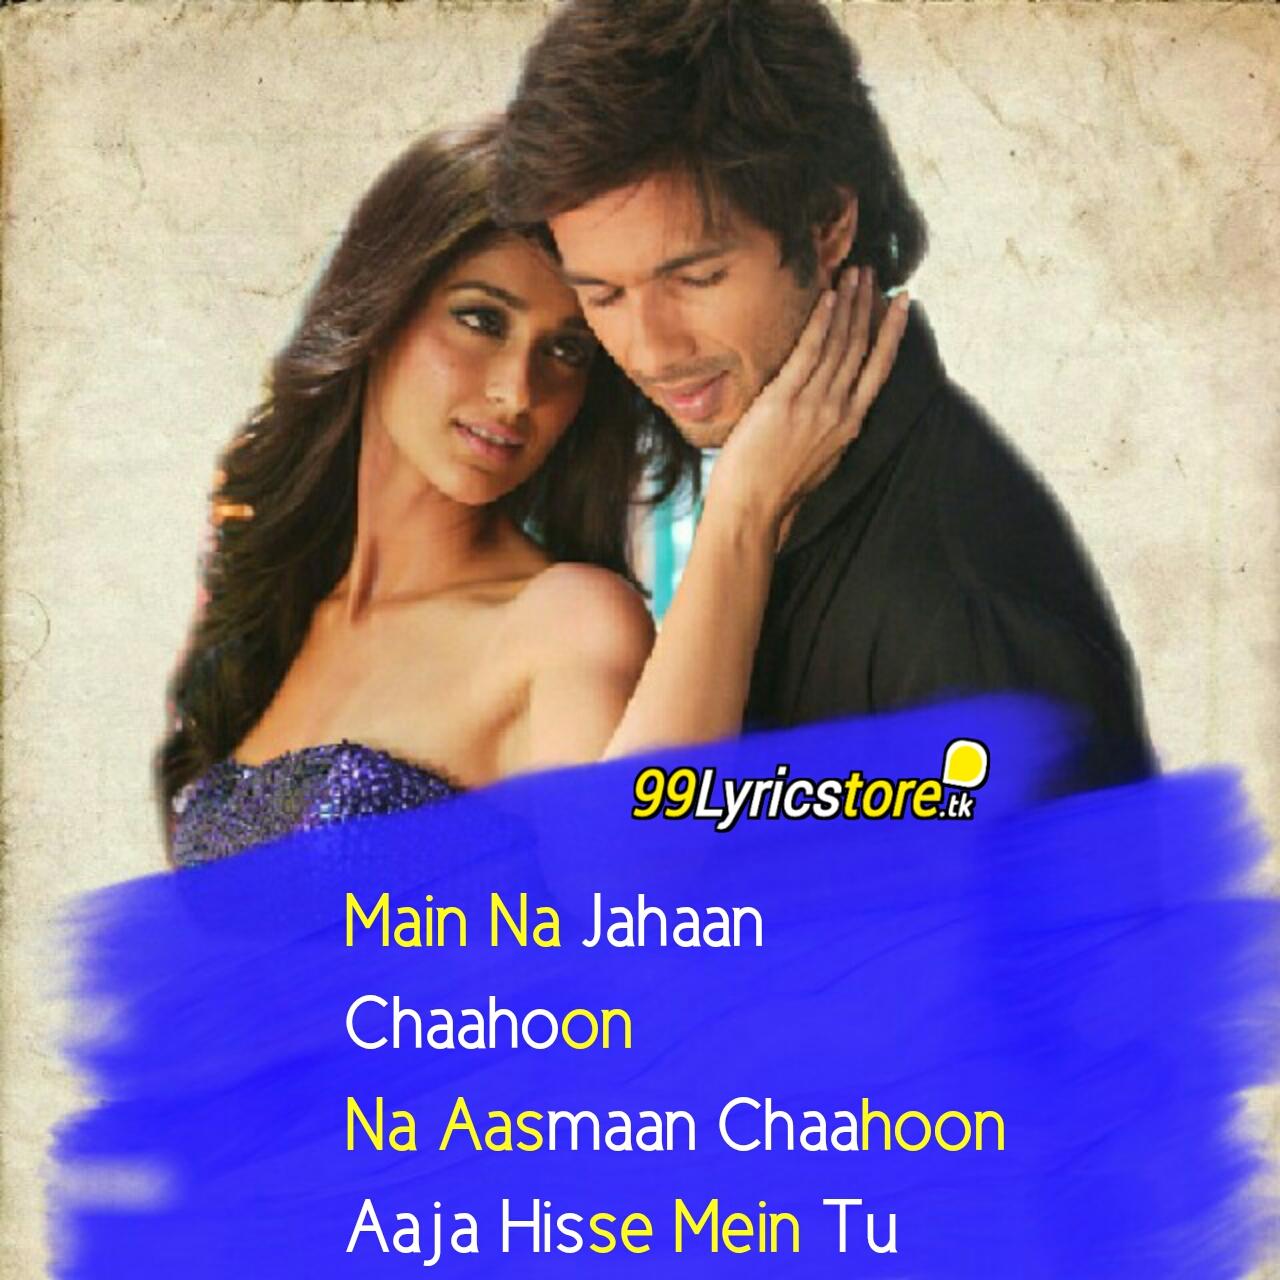 Best Atif Aslam Song Lyrics, Shahid Kapoor Song Lyrics, Ileana D'cruz Song Lyrics, Pritam Song Lyrics, Hindi Song Lyrics